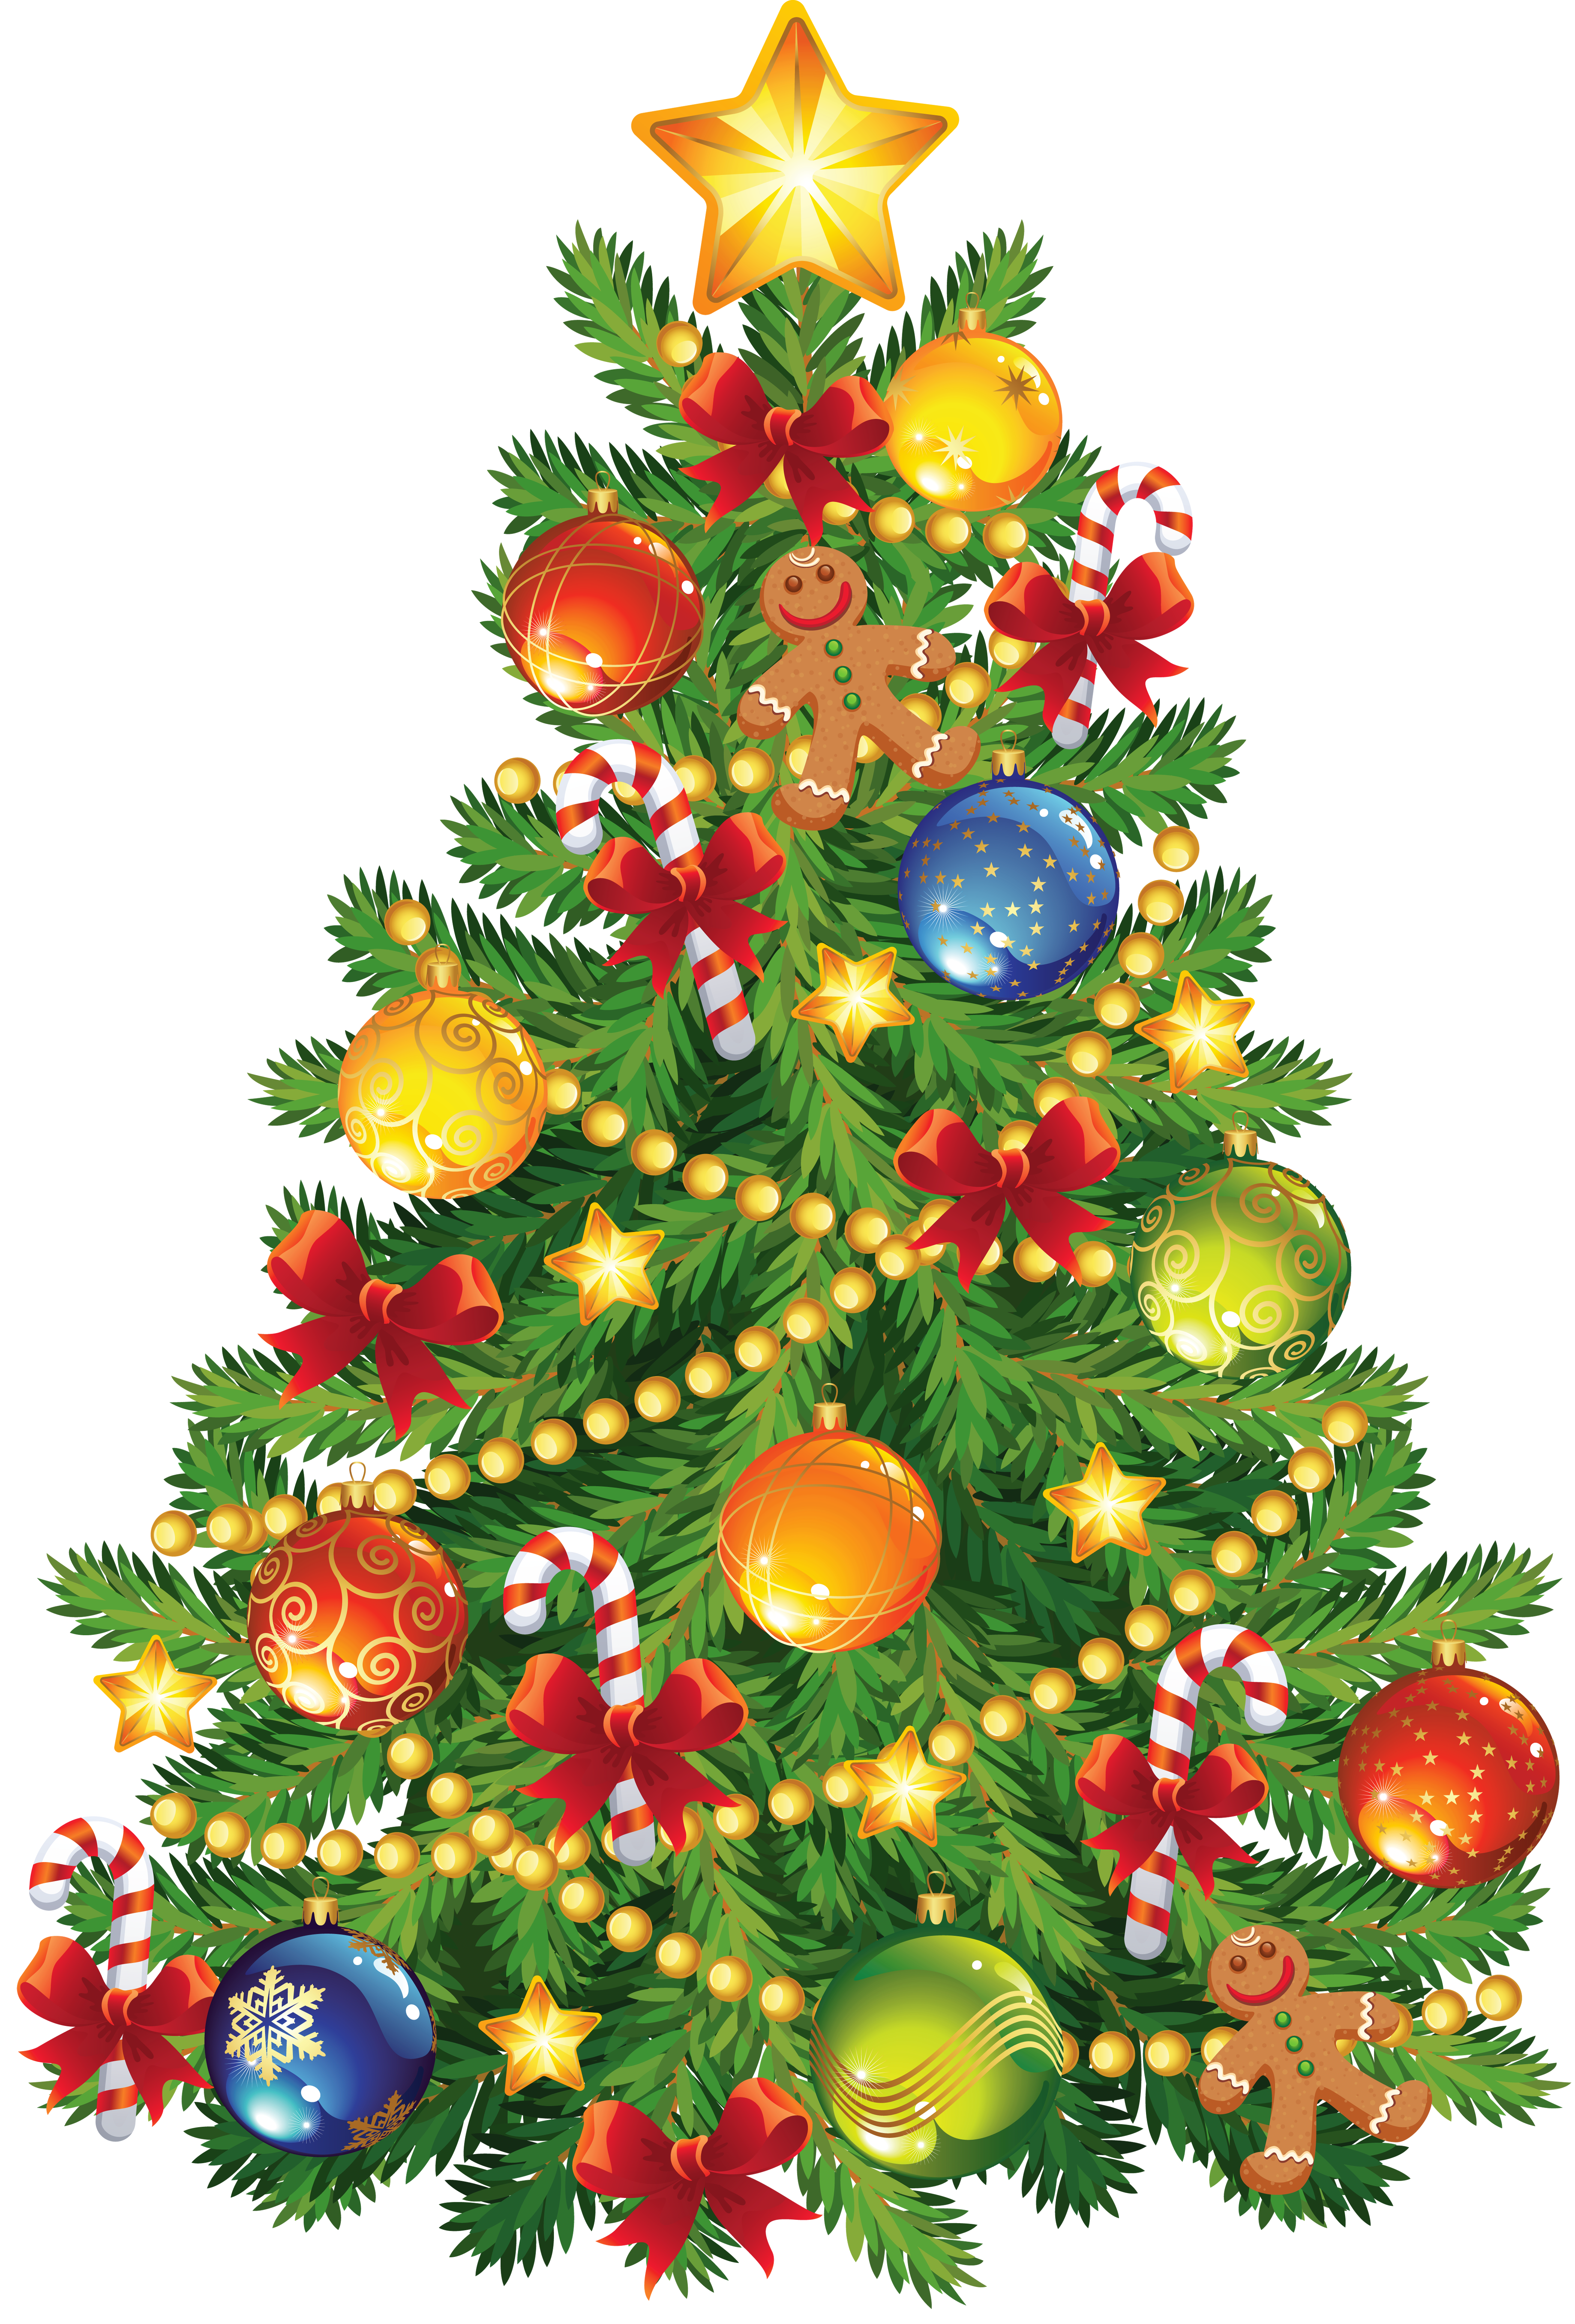 Xmas Stuff For Christmas Trees .